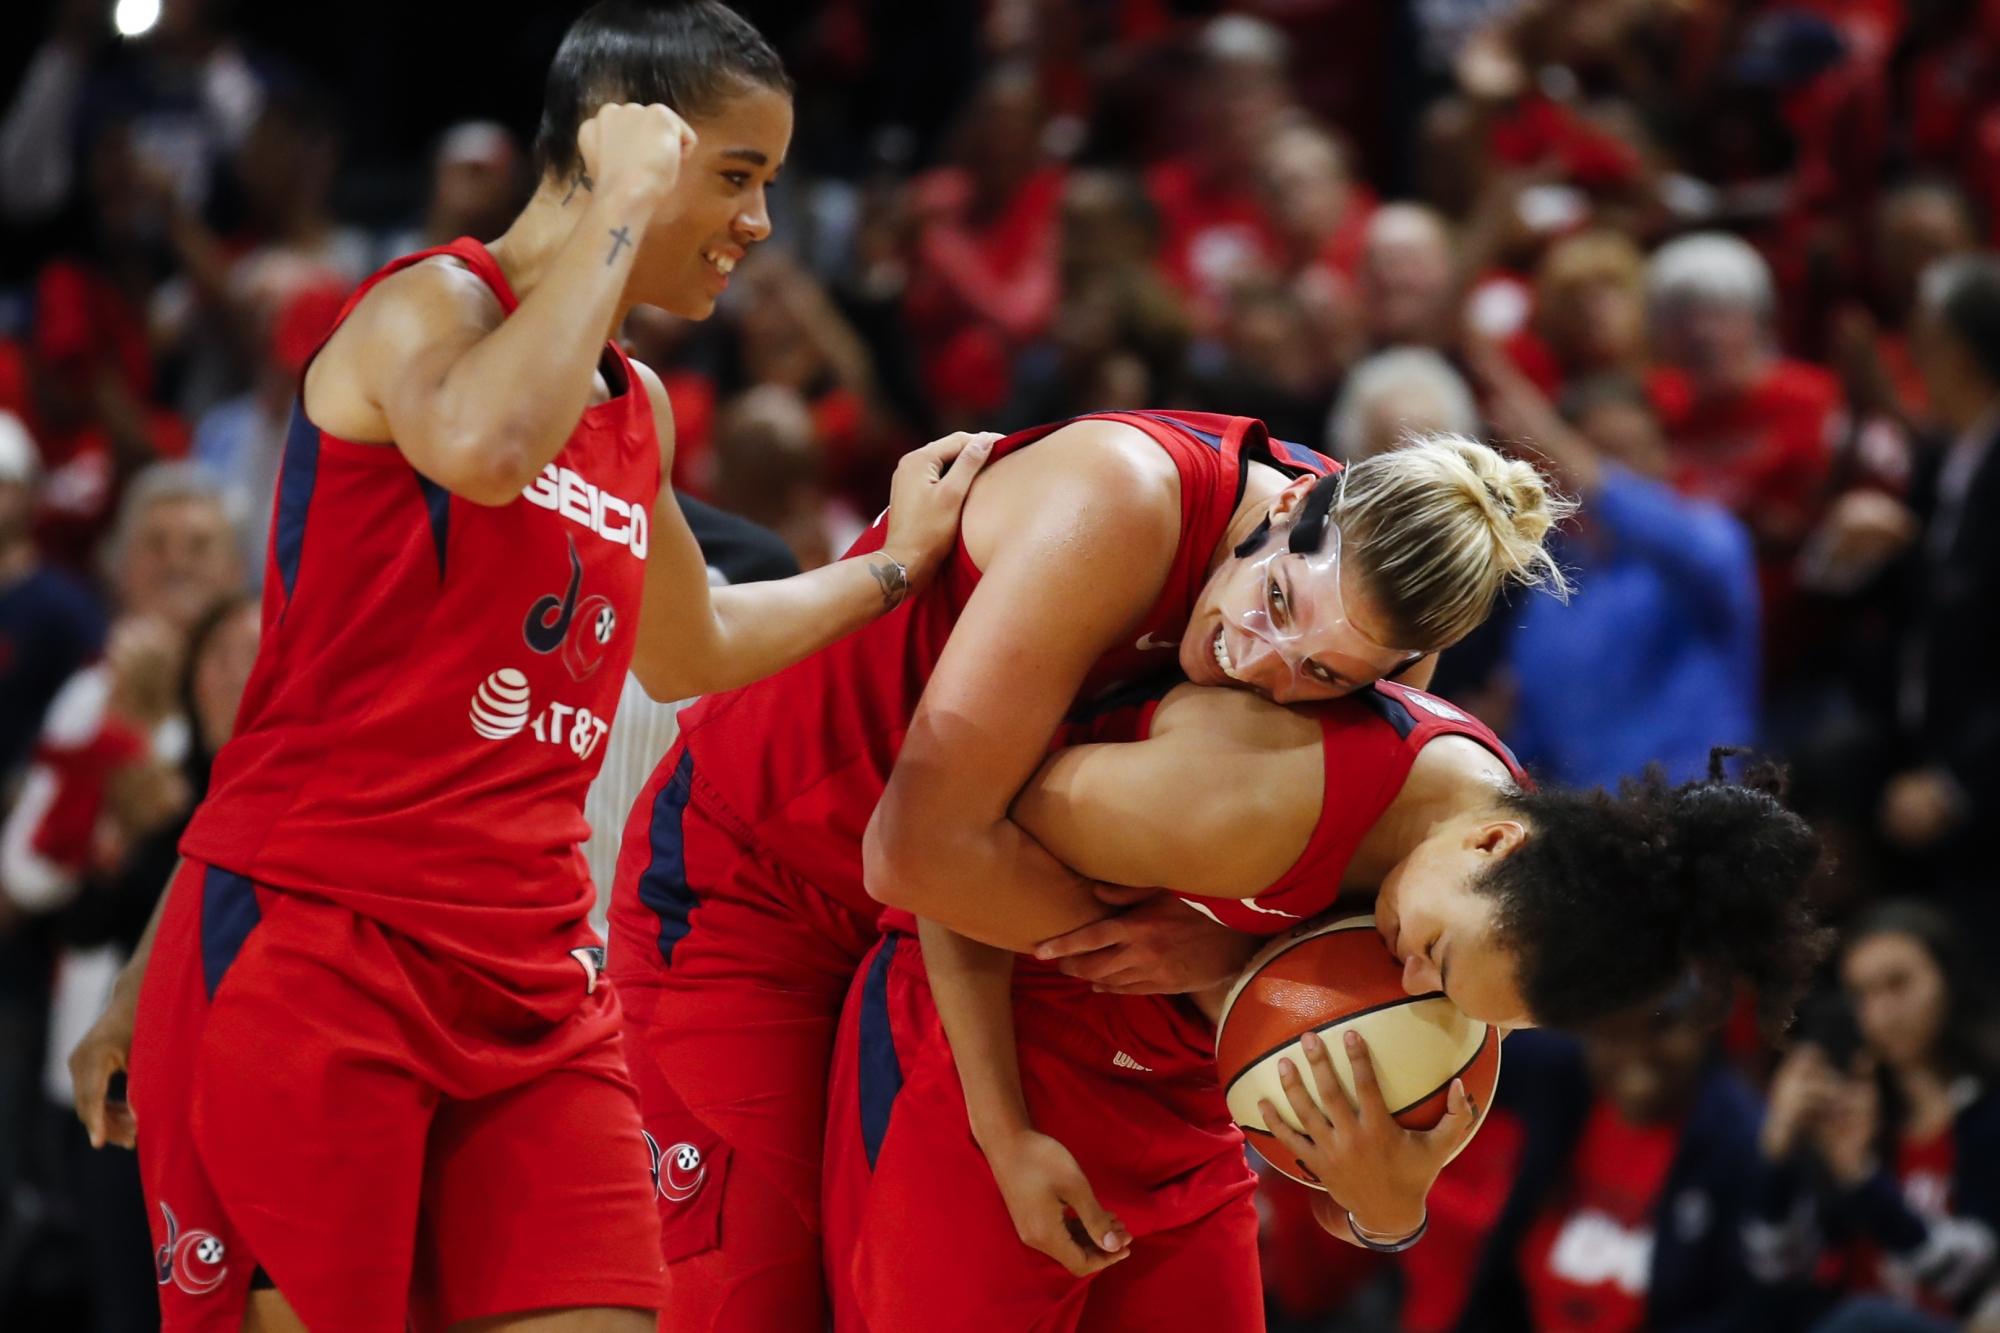 Bruised, battered, but never broken, Mystics run it back, win WNBA title